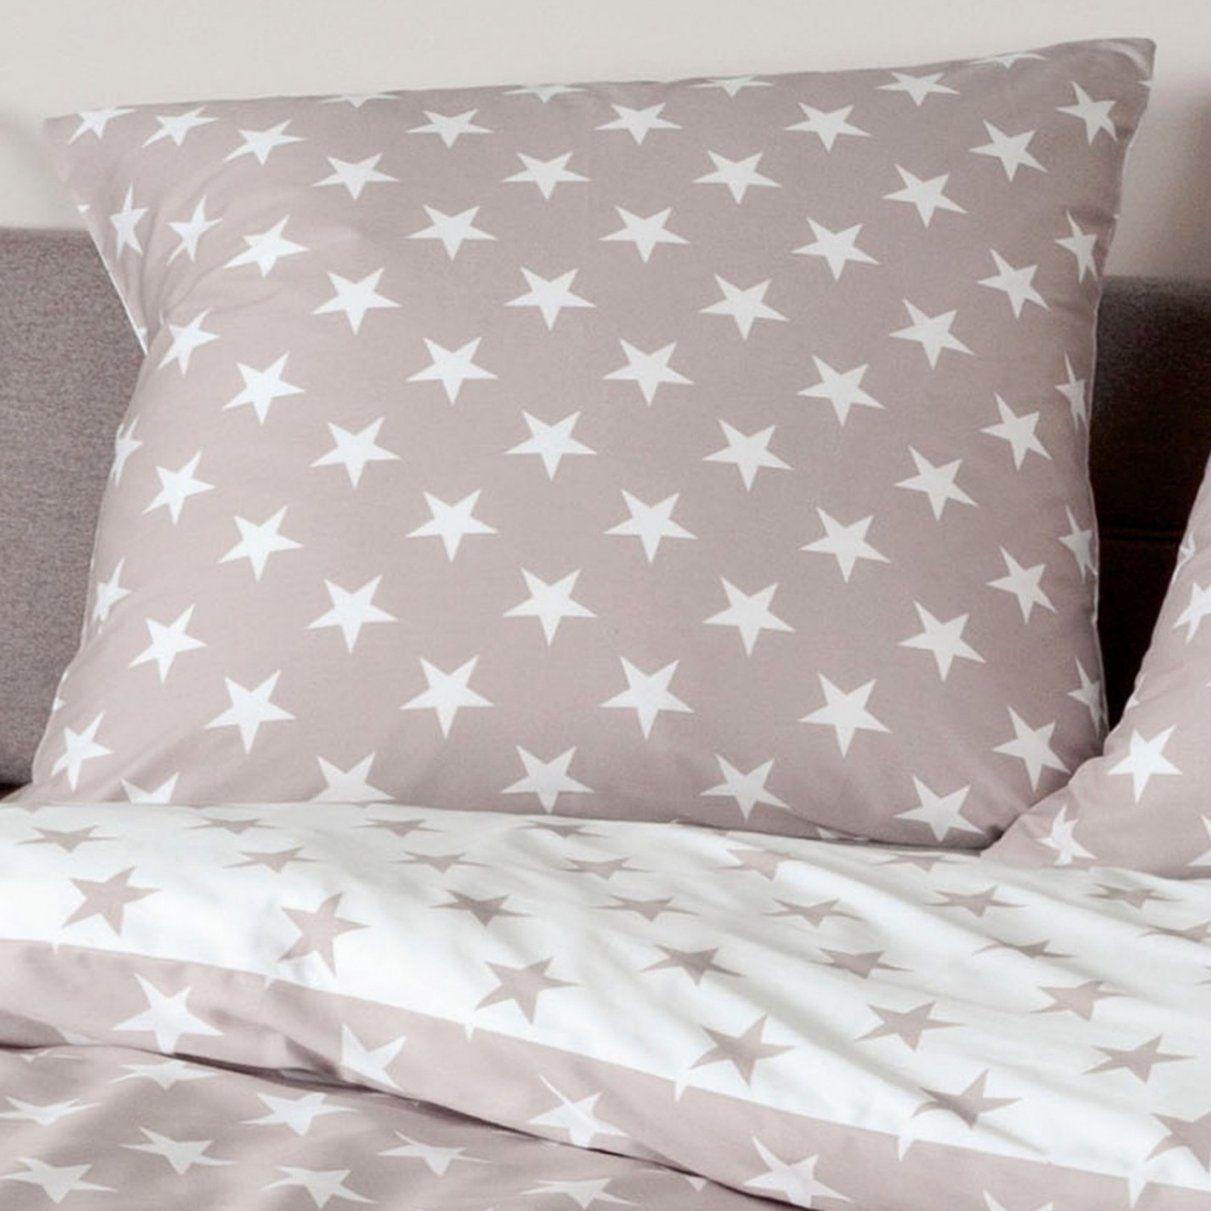 Perfekt Feinbiber Bettwäsche Sterne Zum Biberna Bettwäsche von Biberna Bettwäsche Lagerverkauf Bild